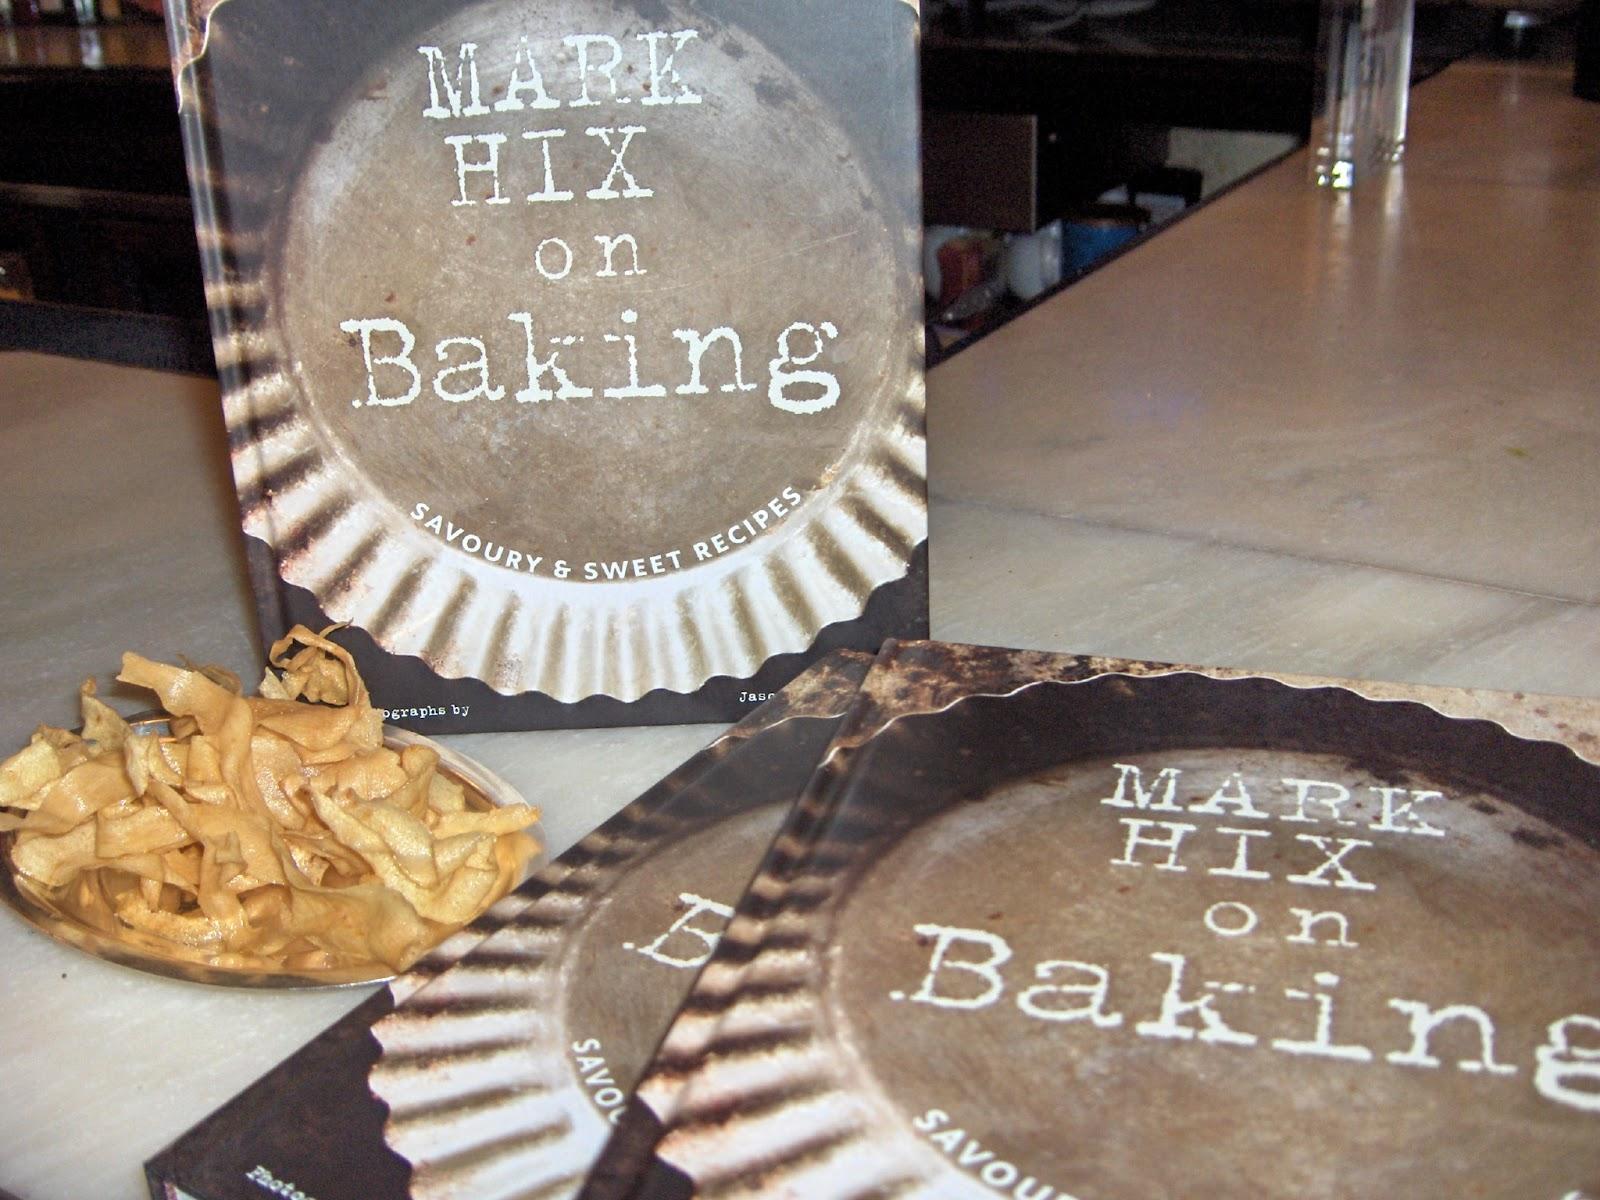 recipe will be in mark hix s new baking book